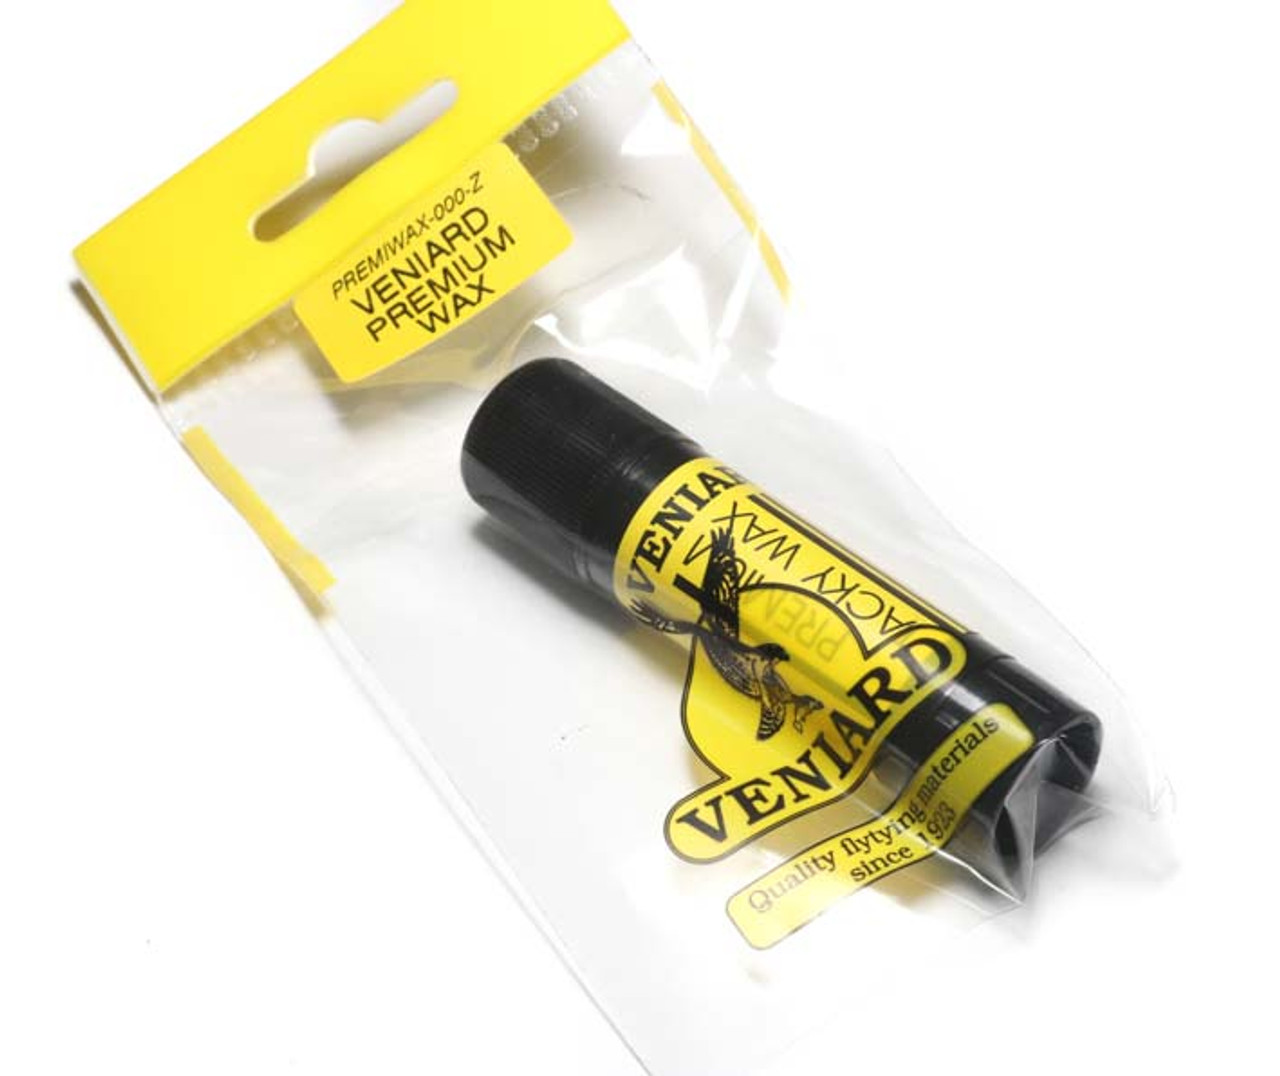 Veniard Premium Tacky Wax